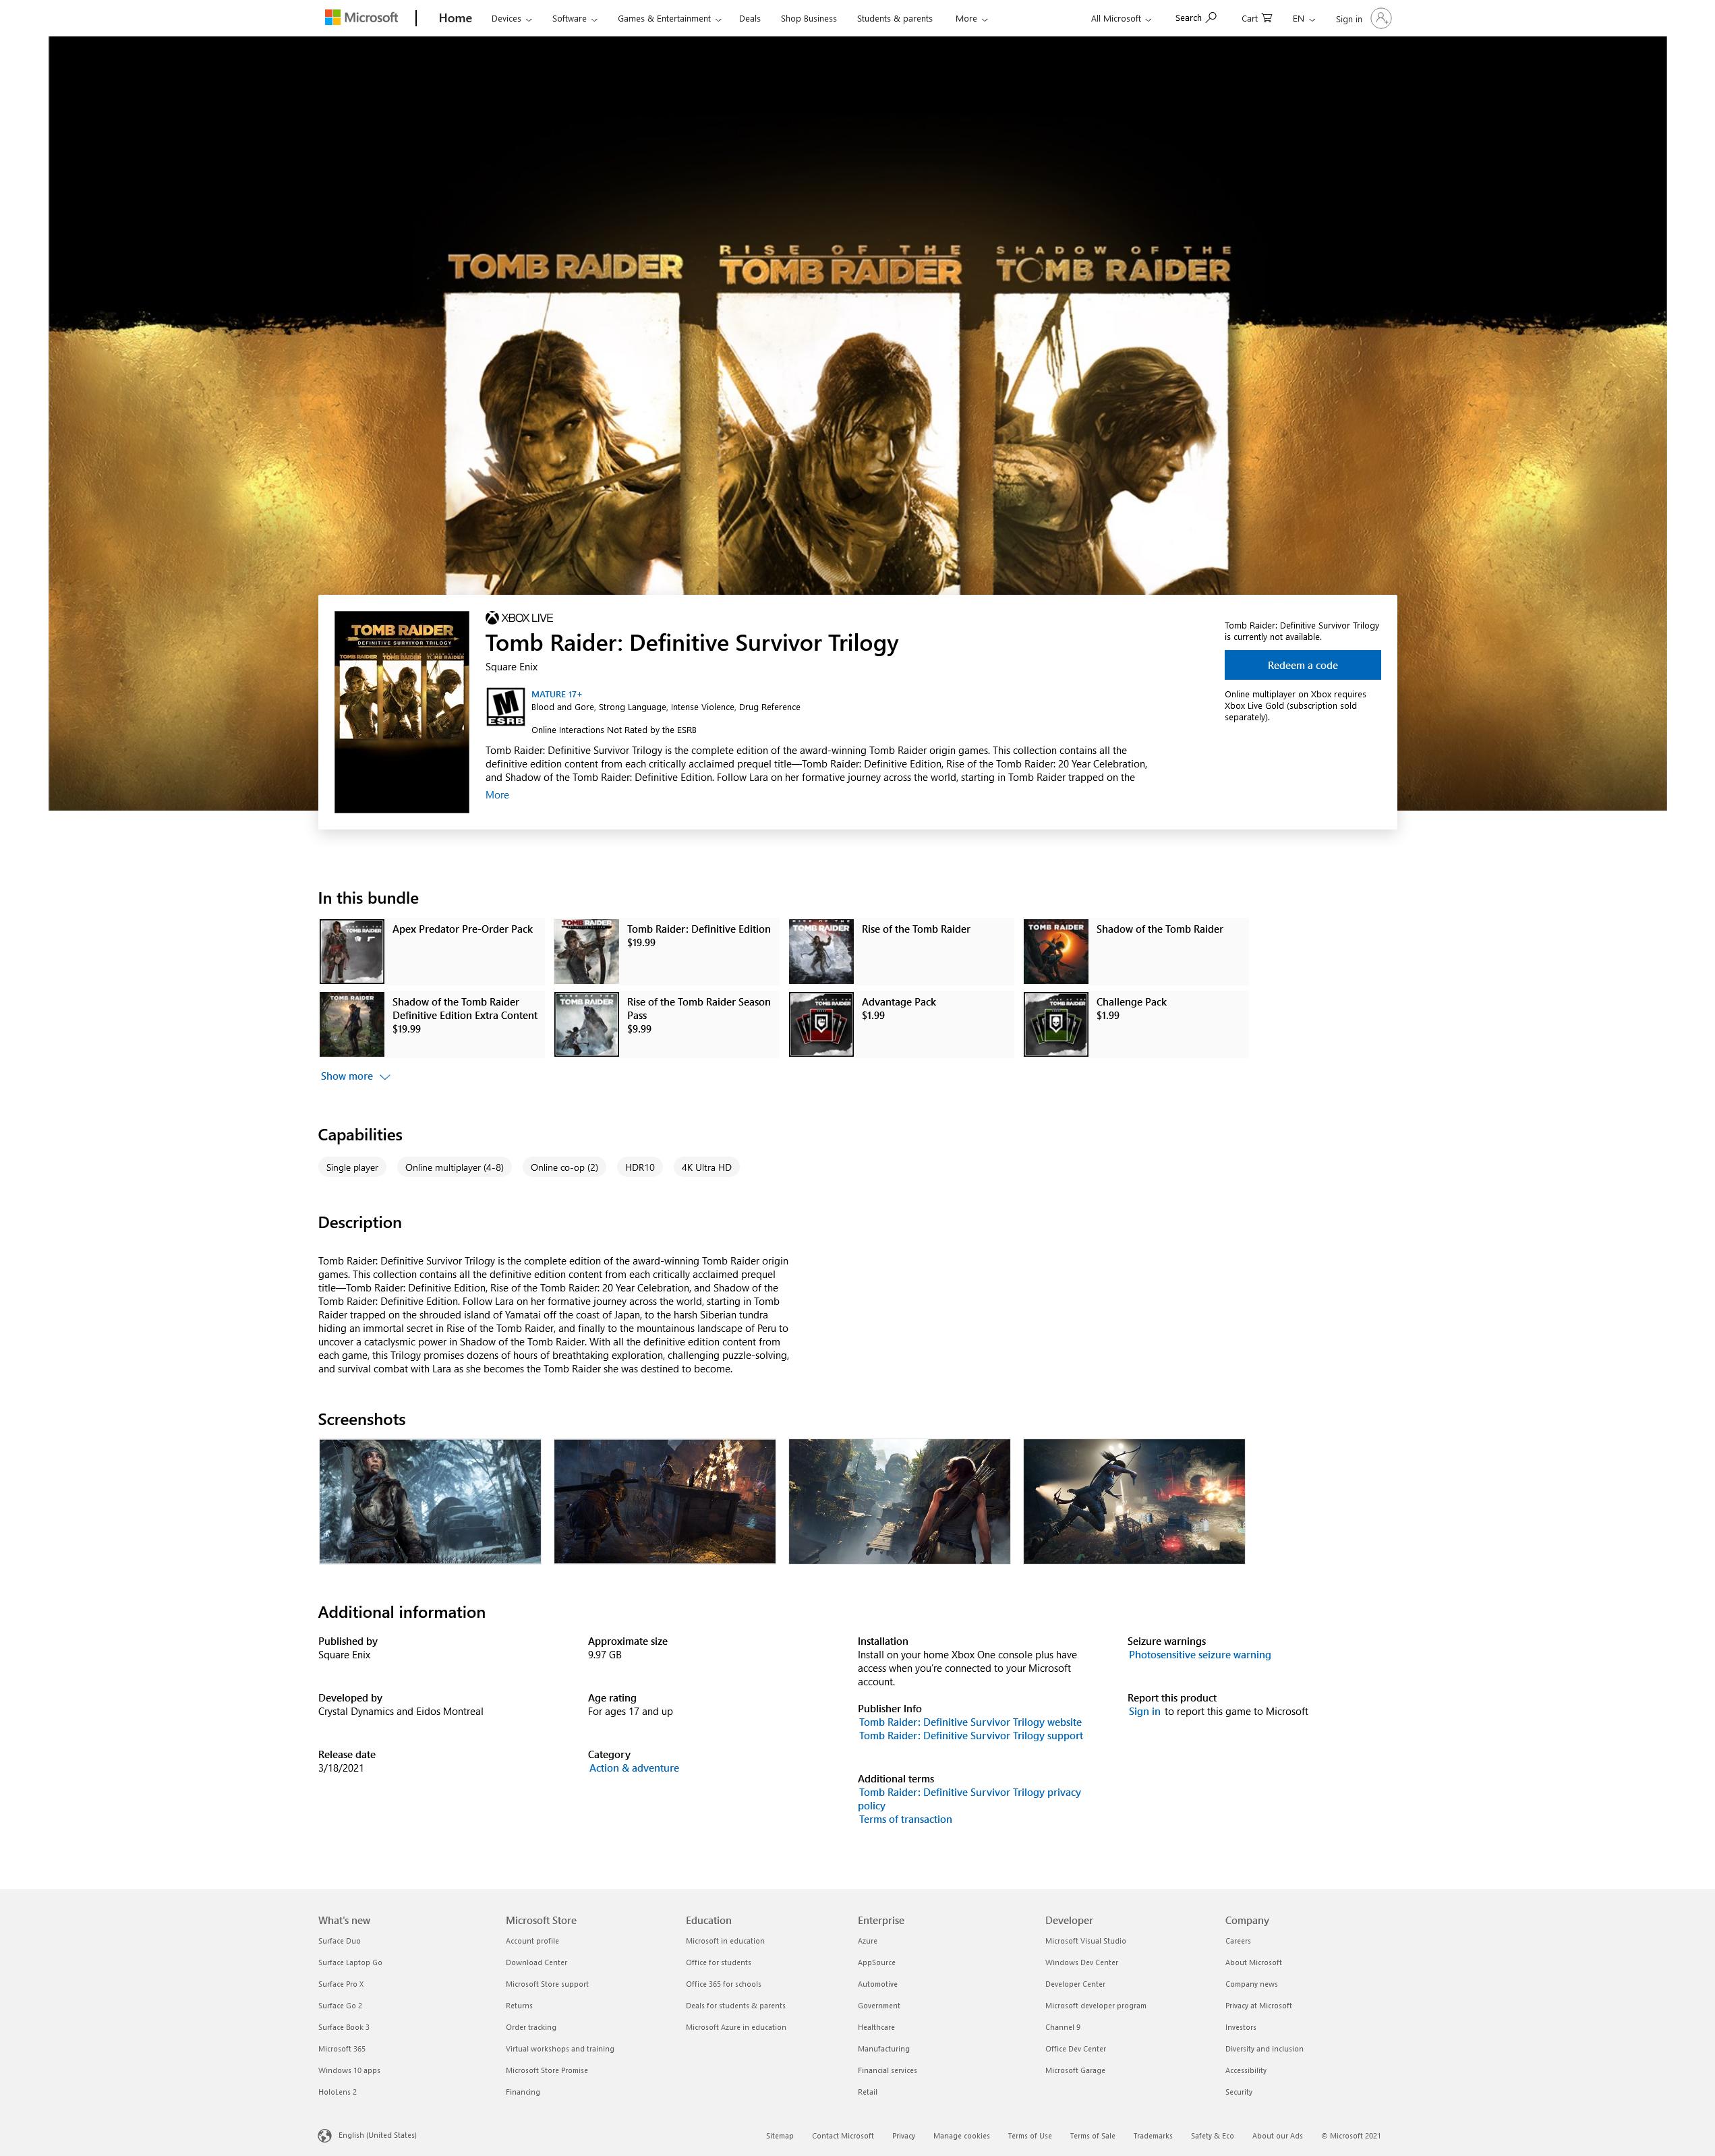 Tomb Raider: Definitive Survivor Trilogy en la Microsoft Store